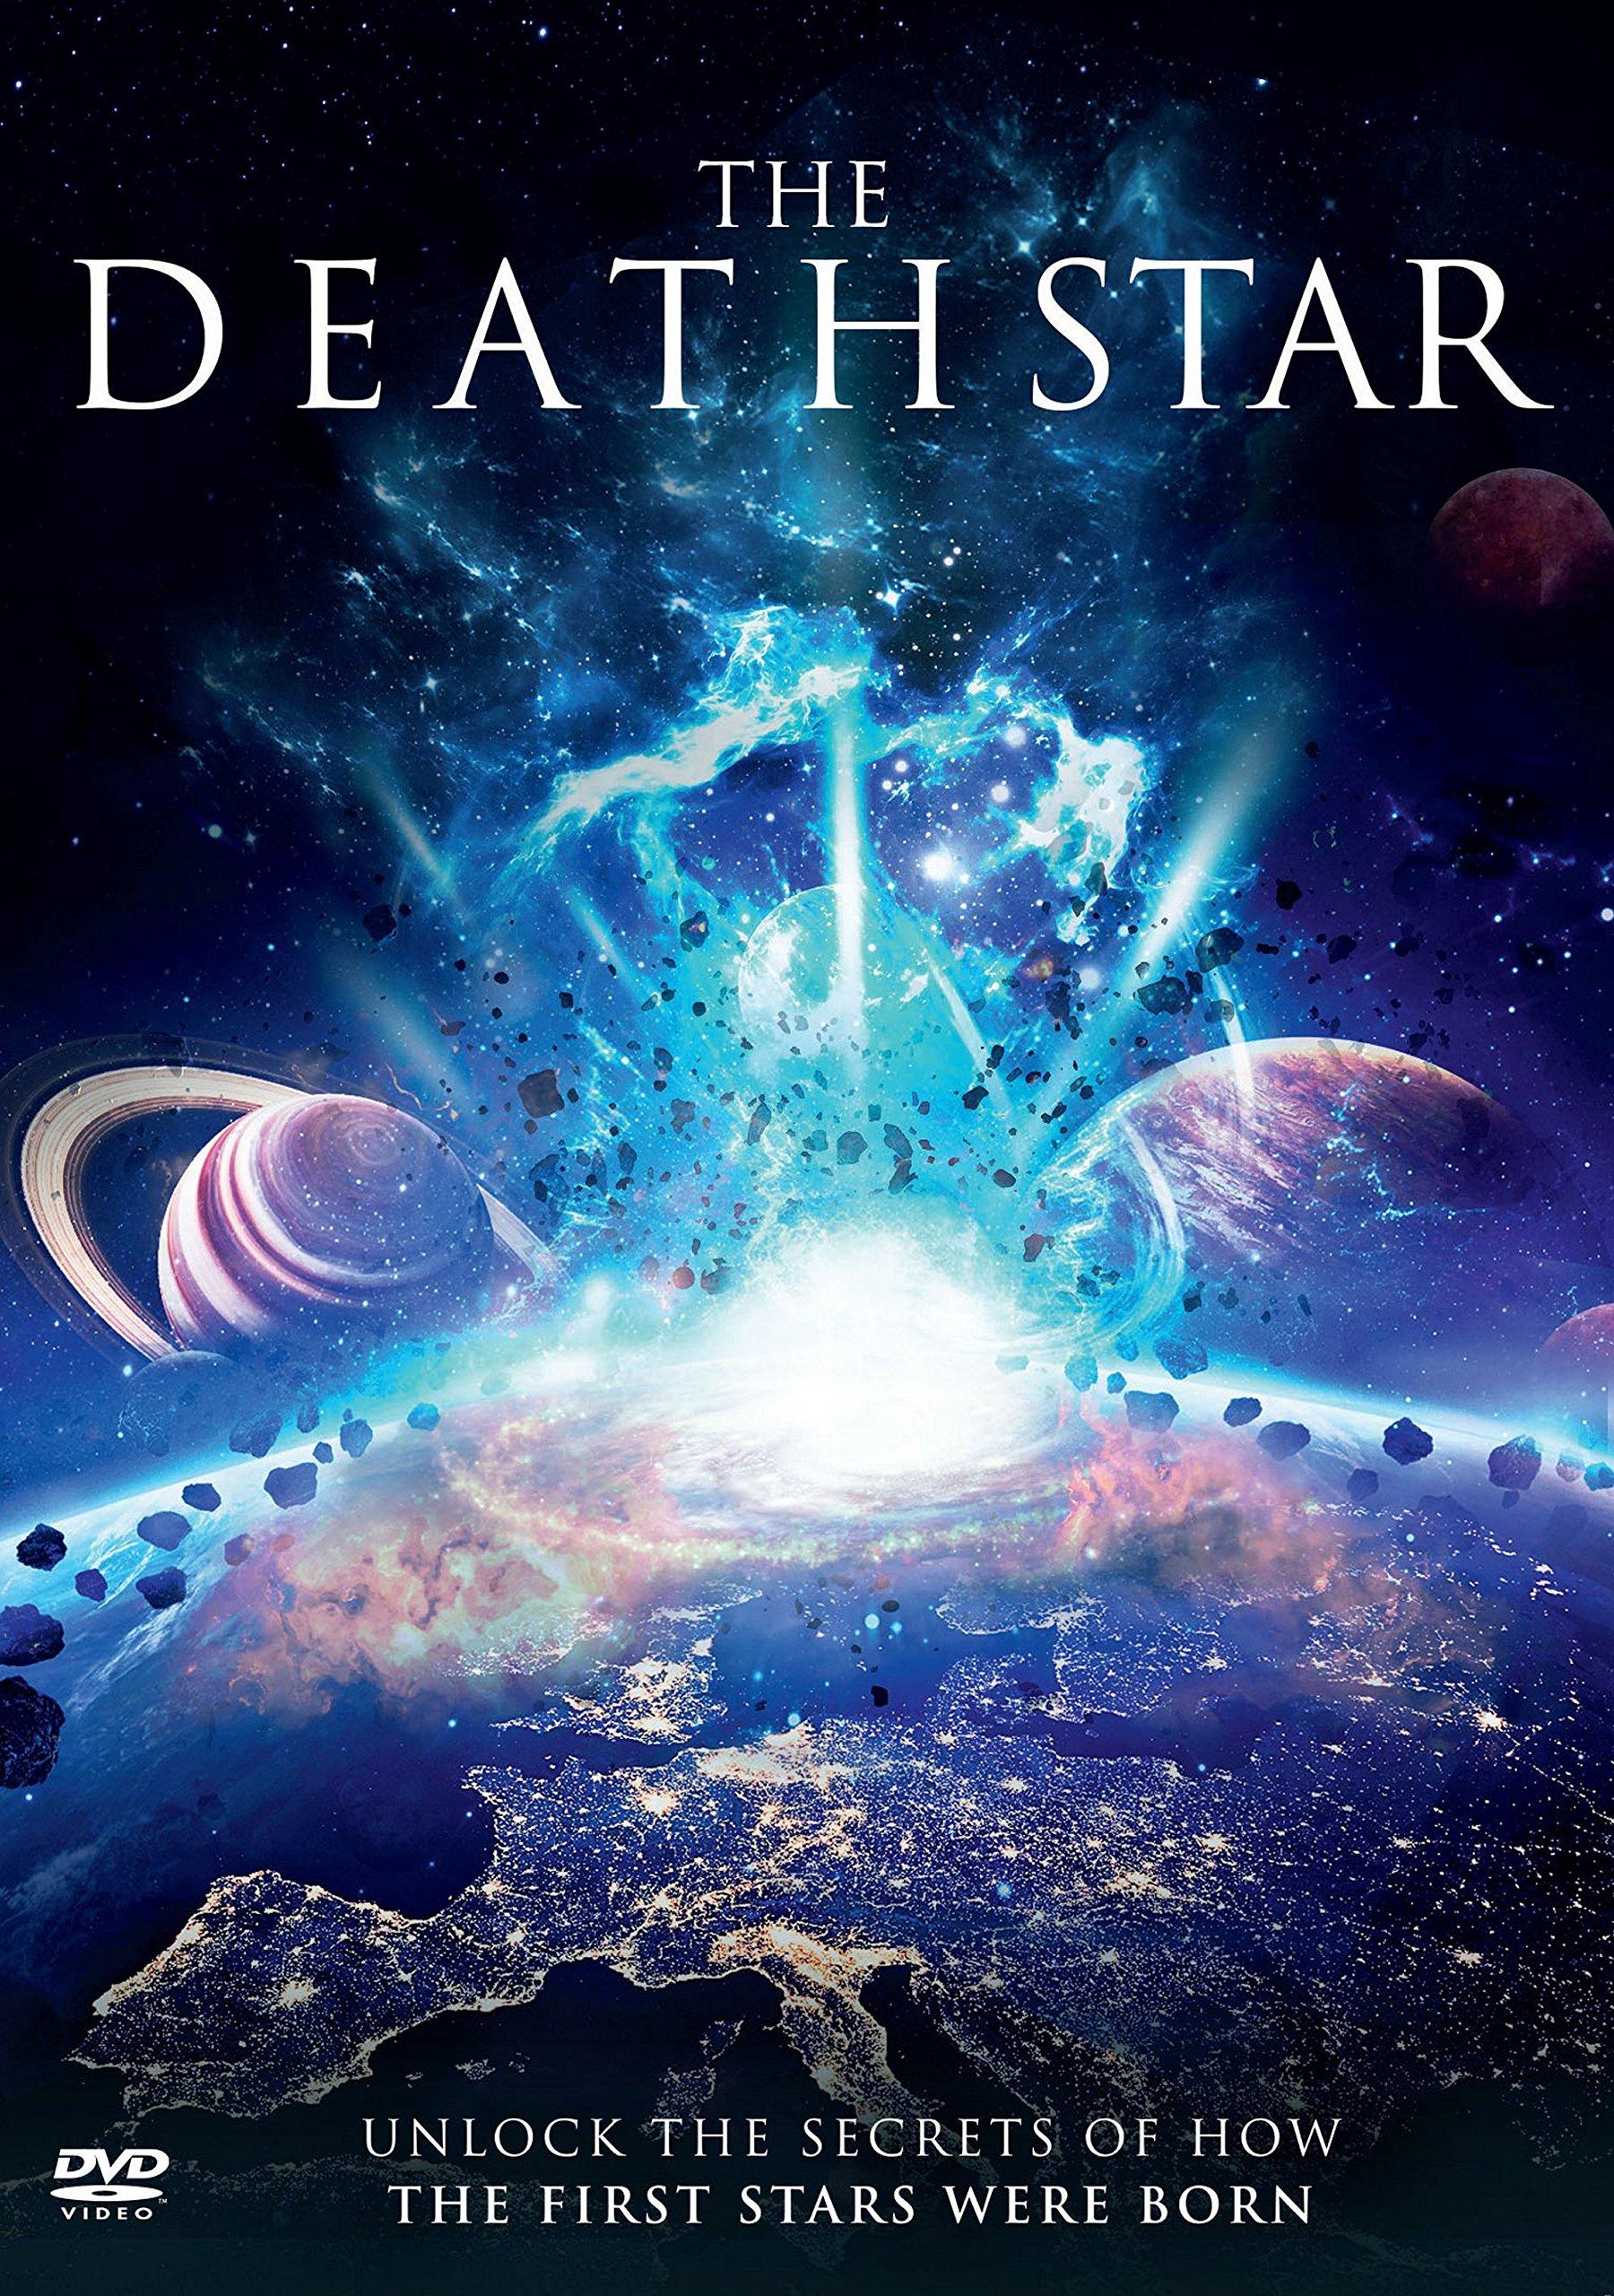 DVD : The Deathstar (DVD)